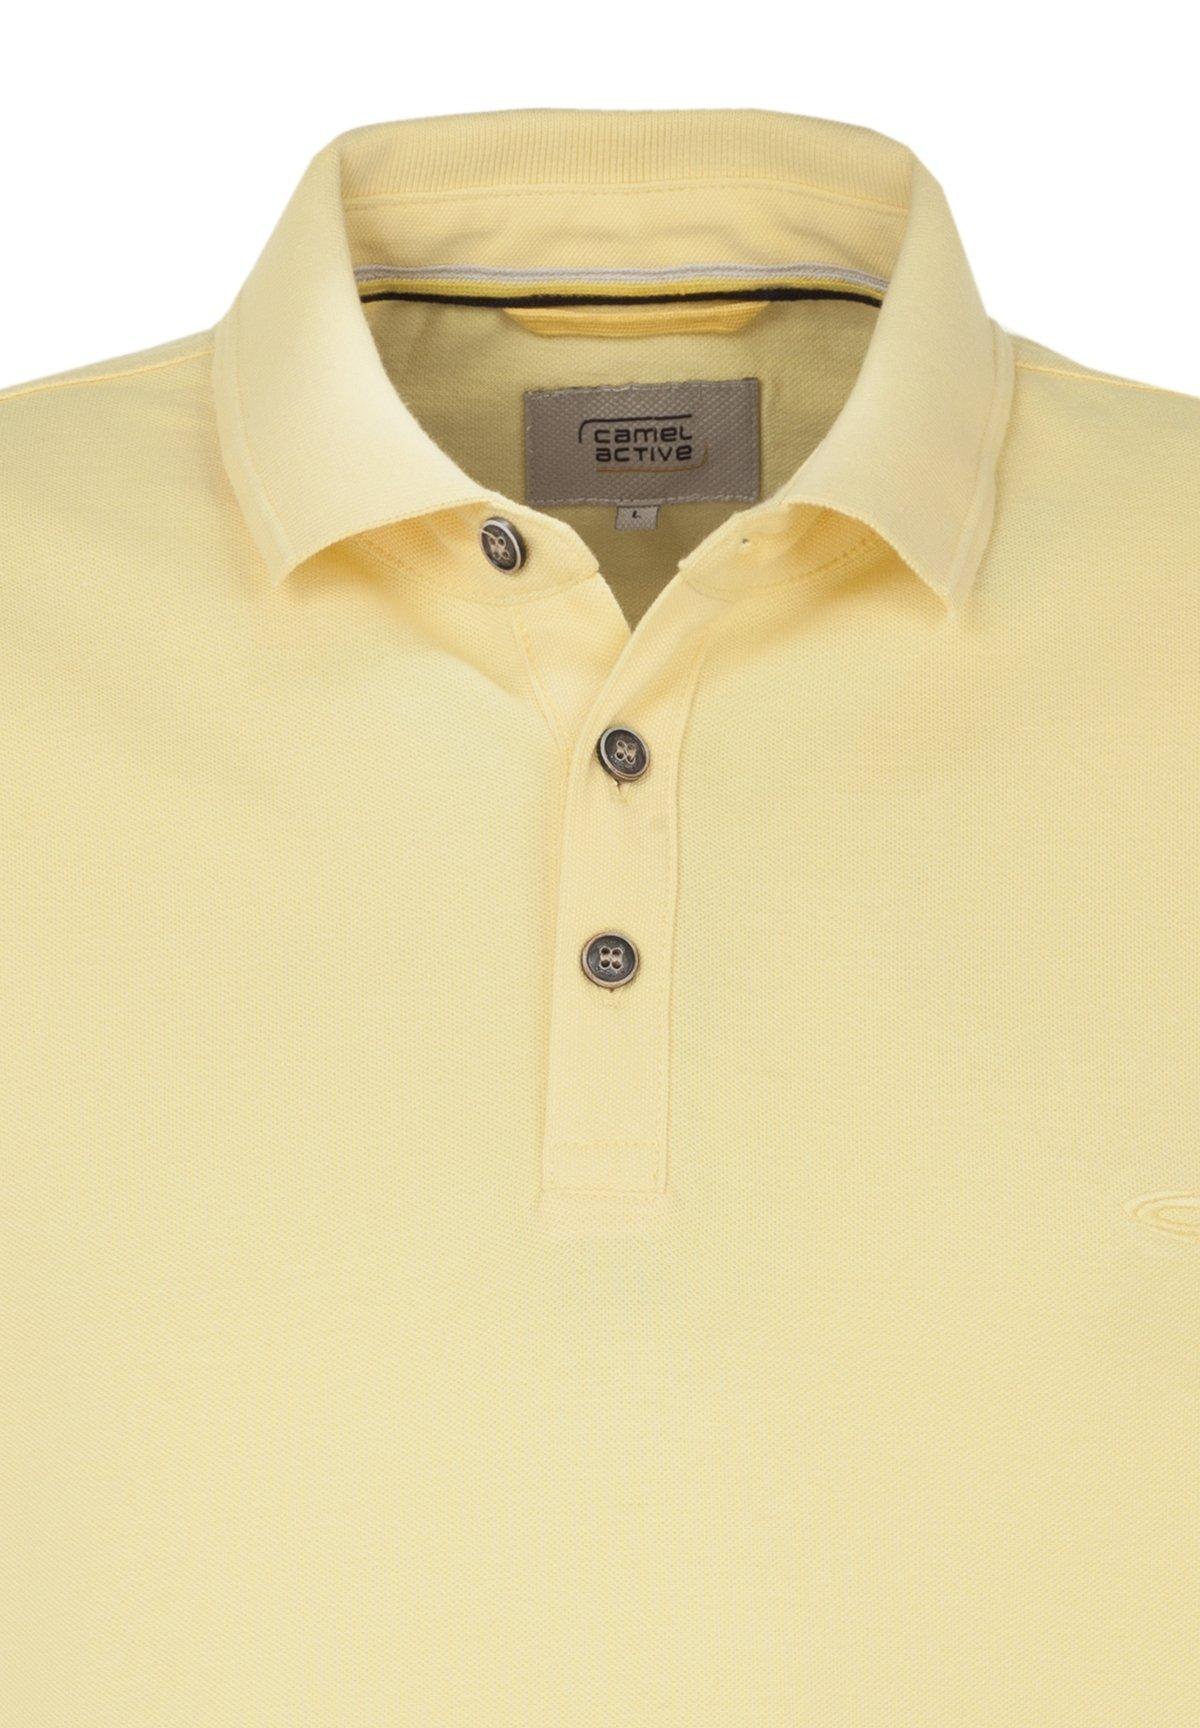 Camel-Active-Herren-Shirt-Poloshirt-Pique-Regular-Fit-NEU Indexbild 70